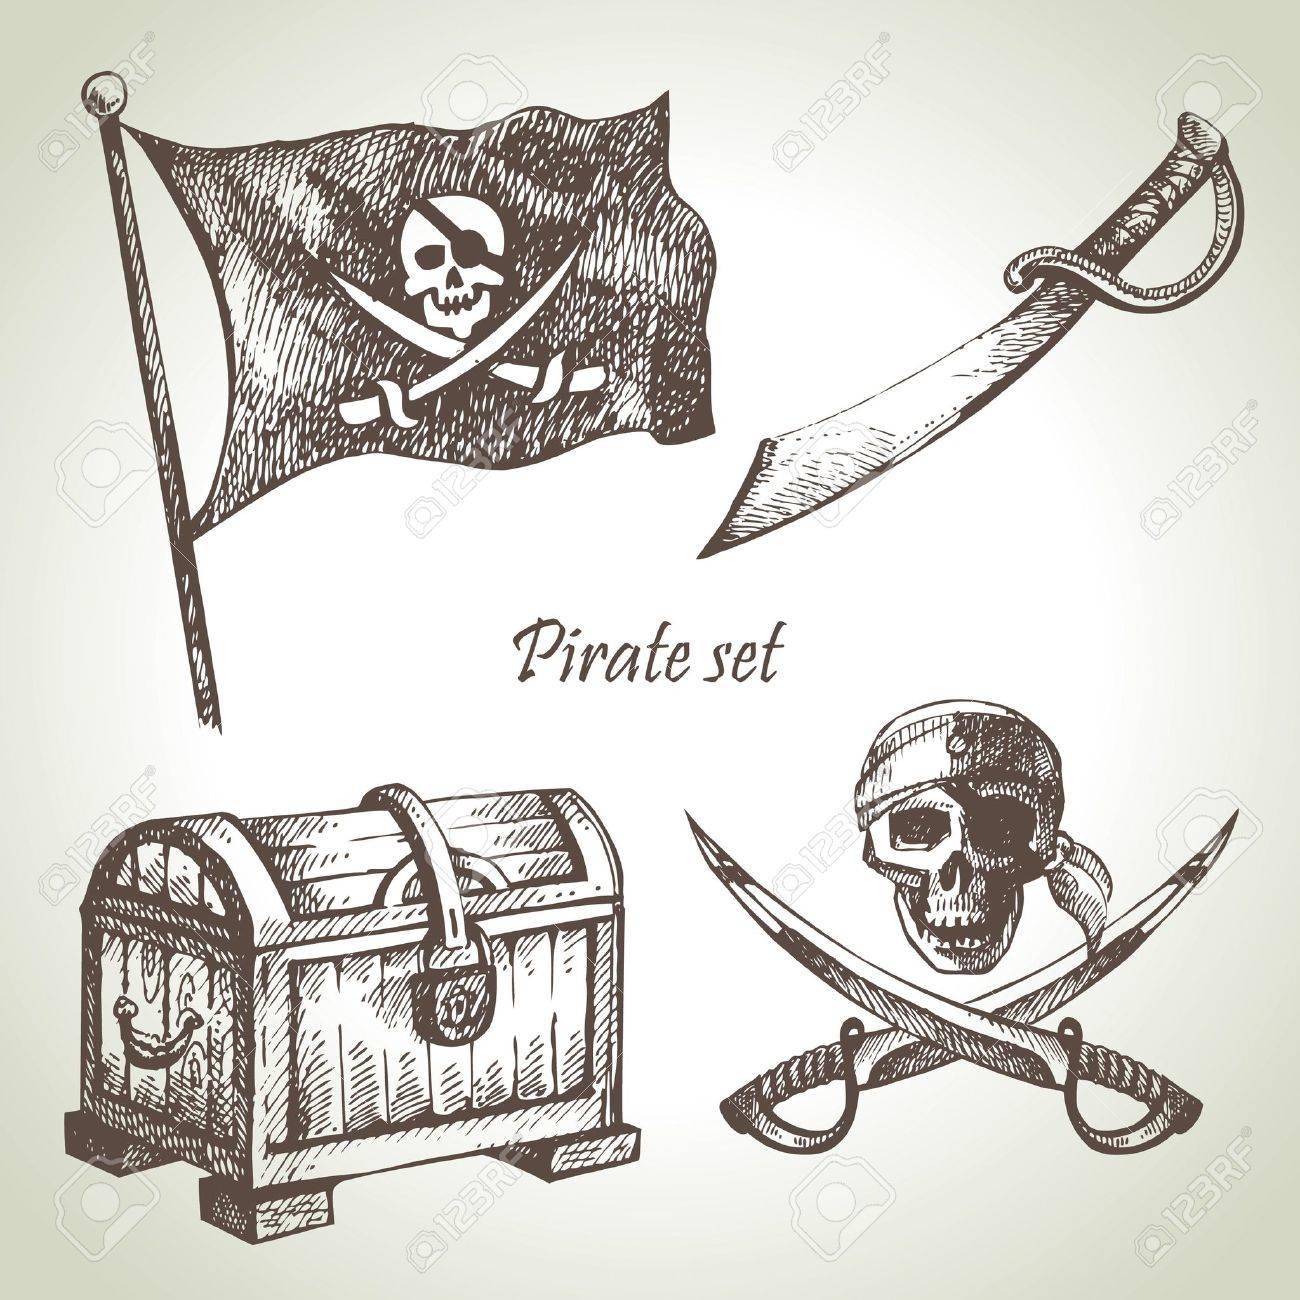 Pirates set. Hand drawn illustrations Stock Vector - 17126169